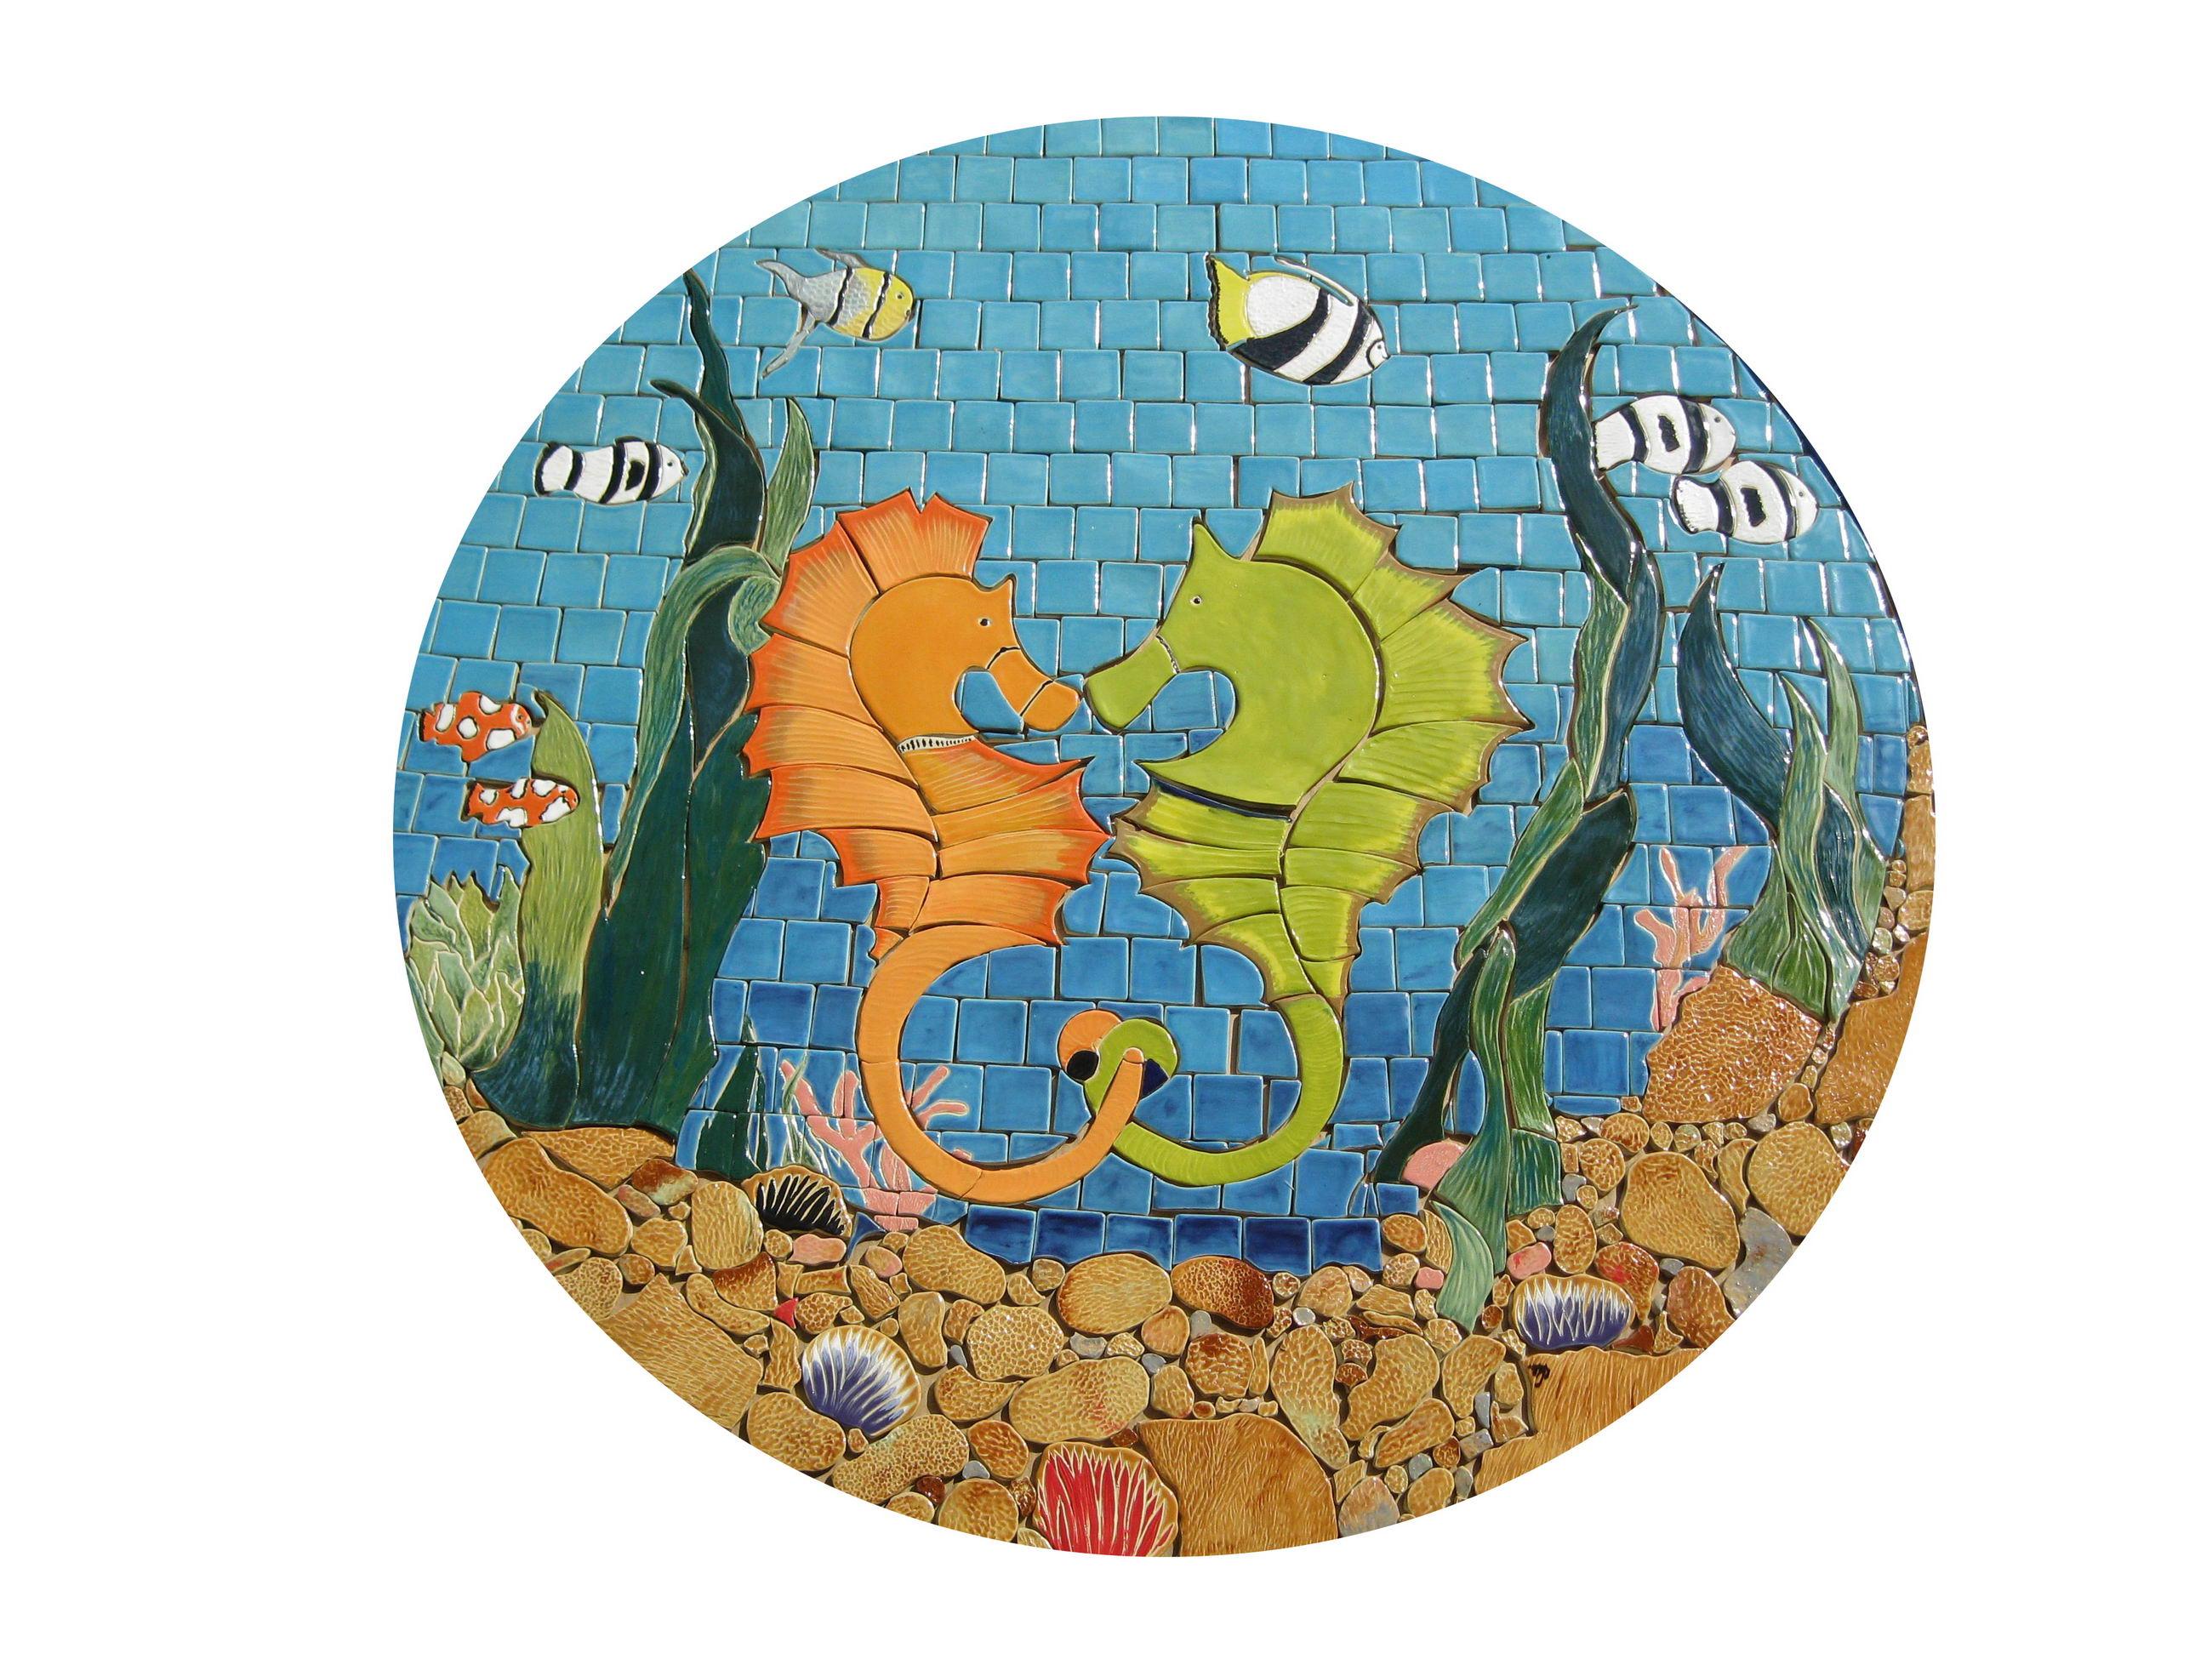 a.Seahorses